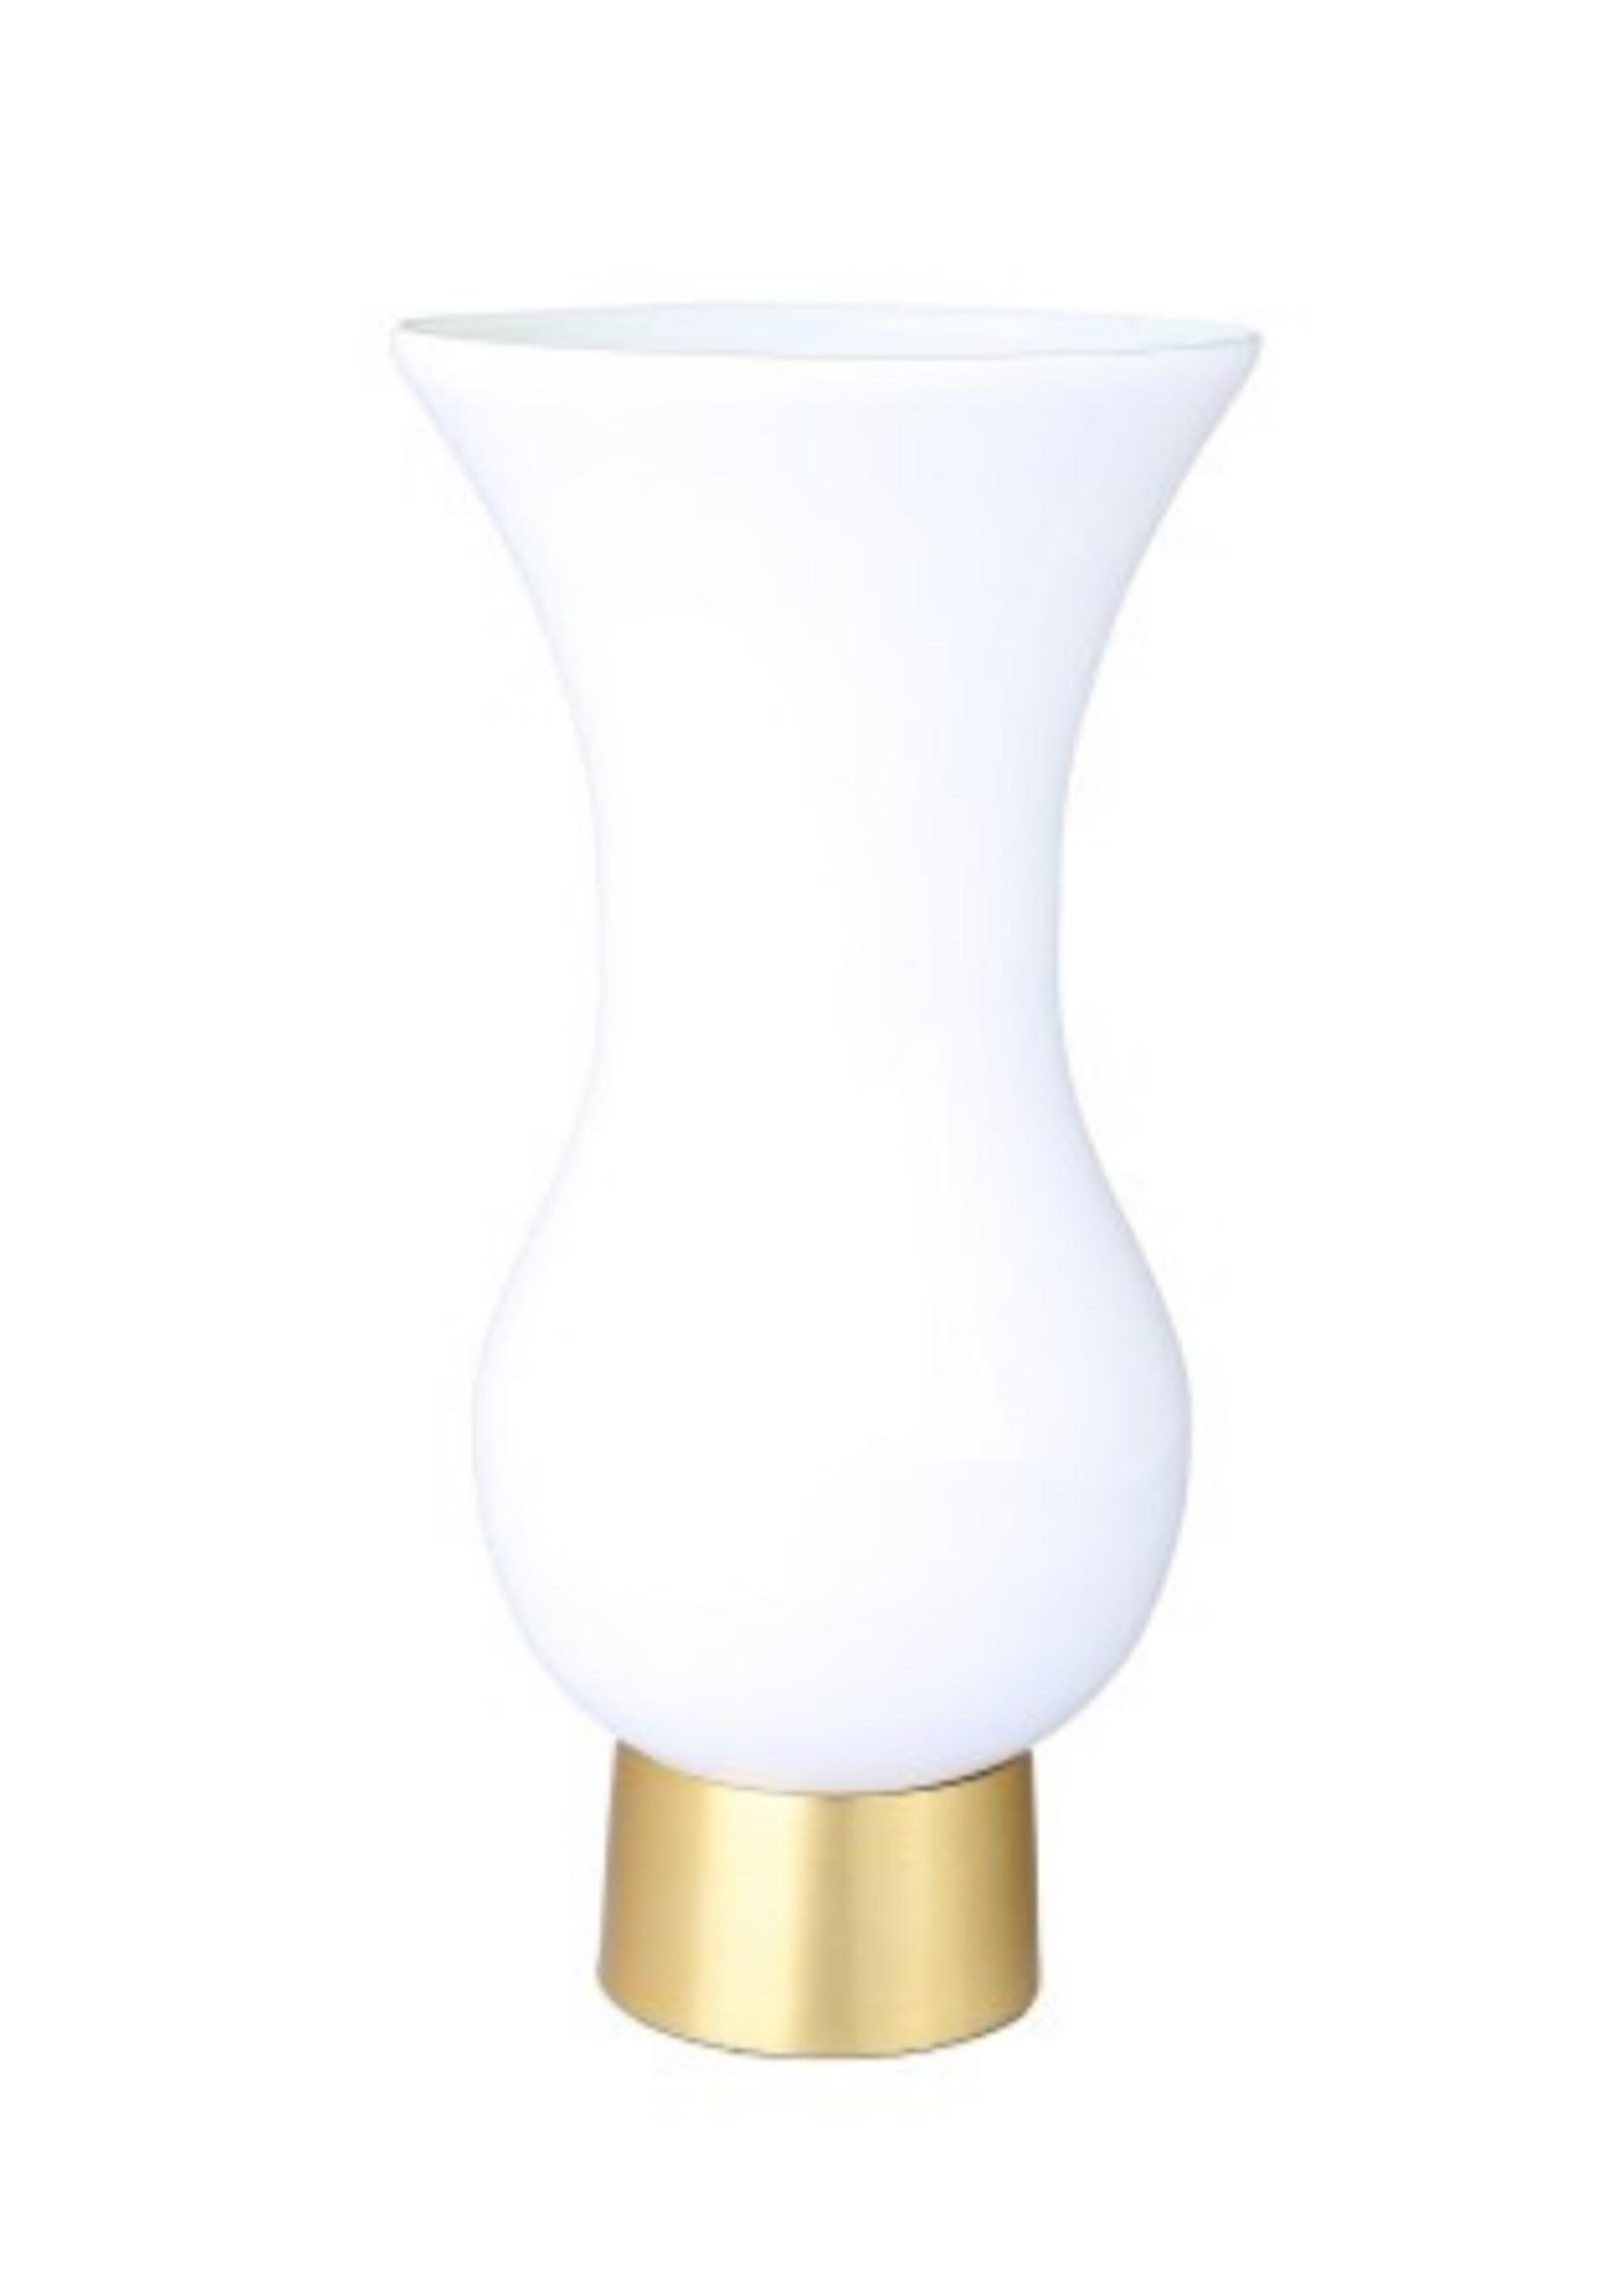 Medium White Glass & Gold Base Vase